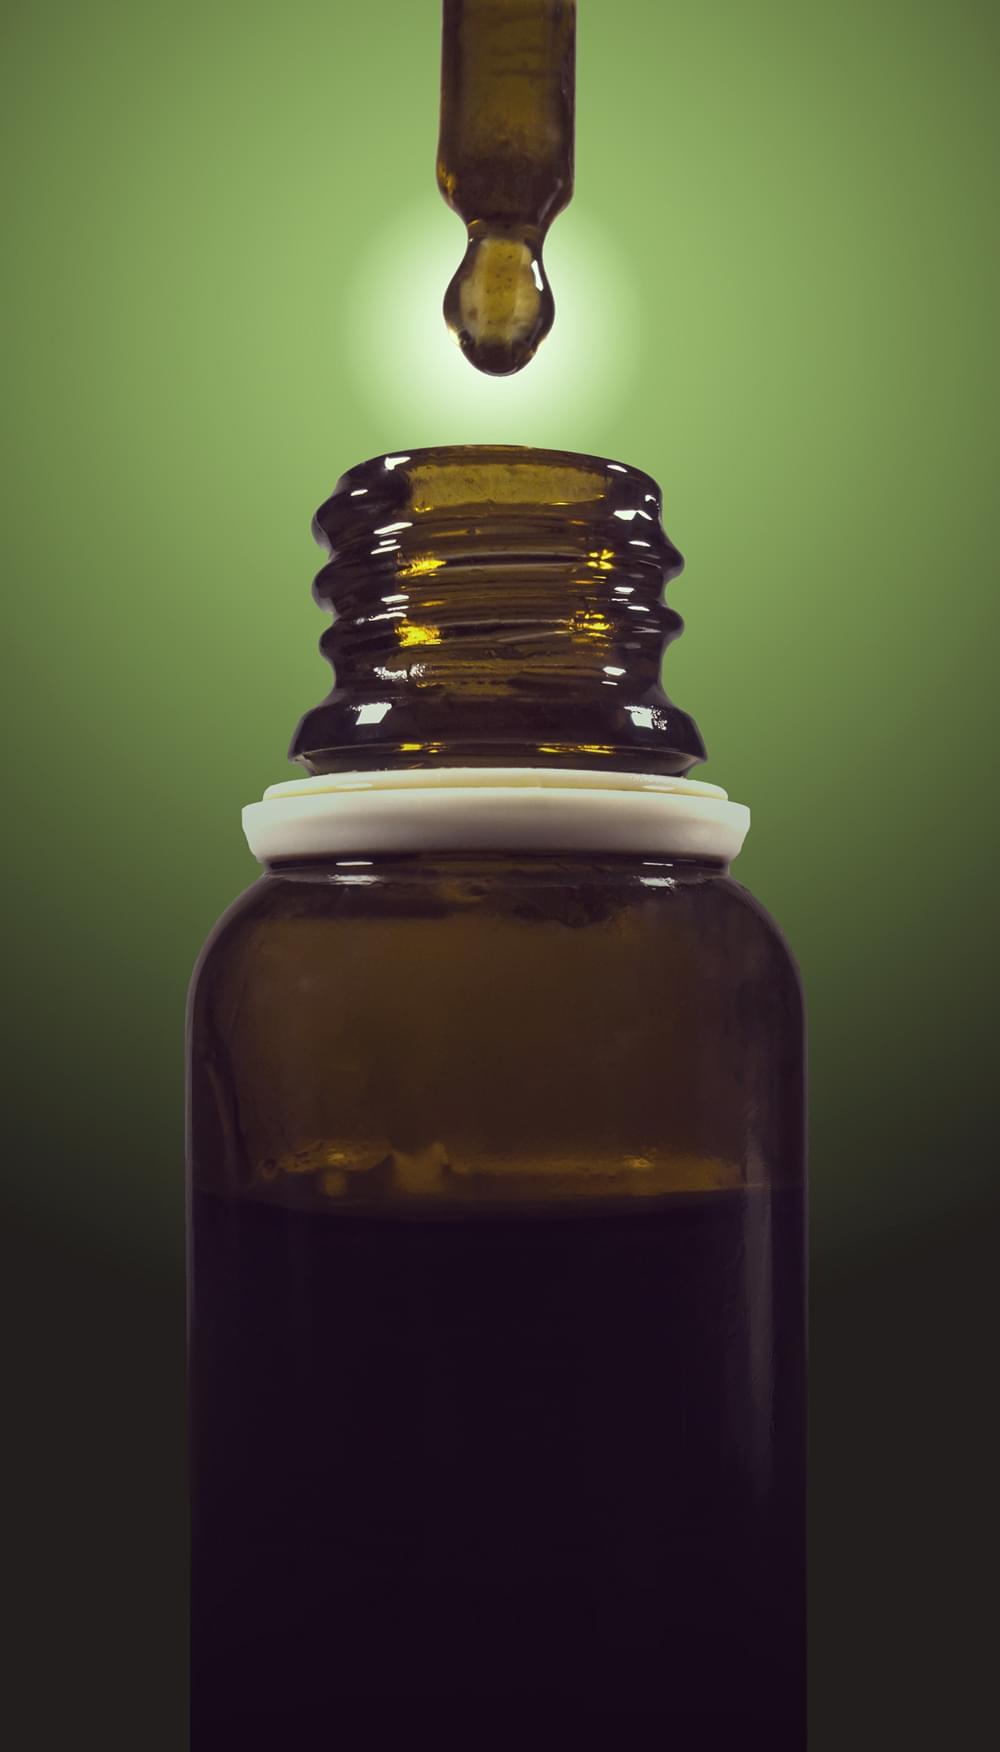 cbd regelgeving uk cannabis medische marihuana